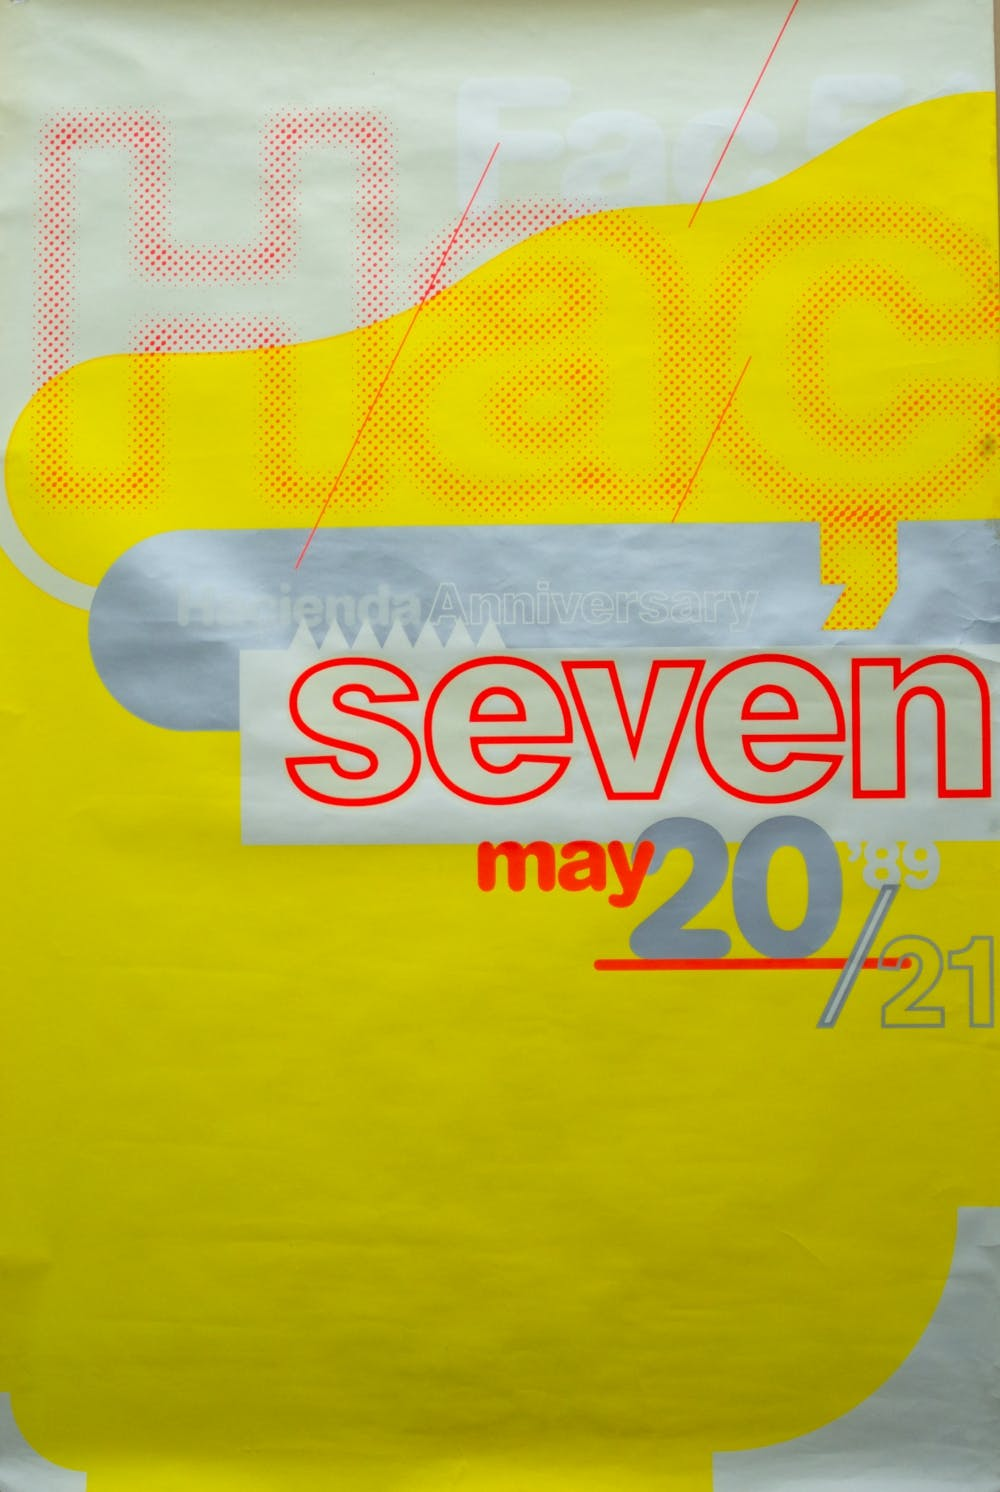 SEVENTH BIRTHDAY PARTY 20_05_89